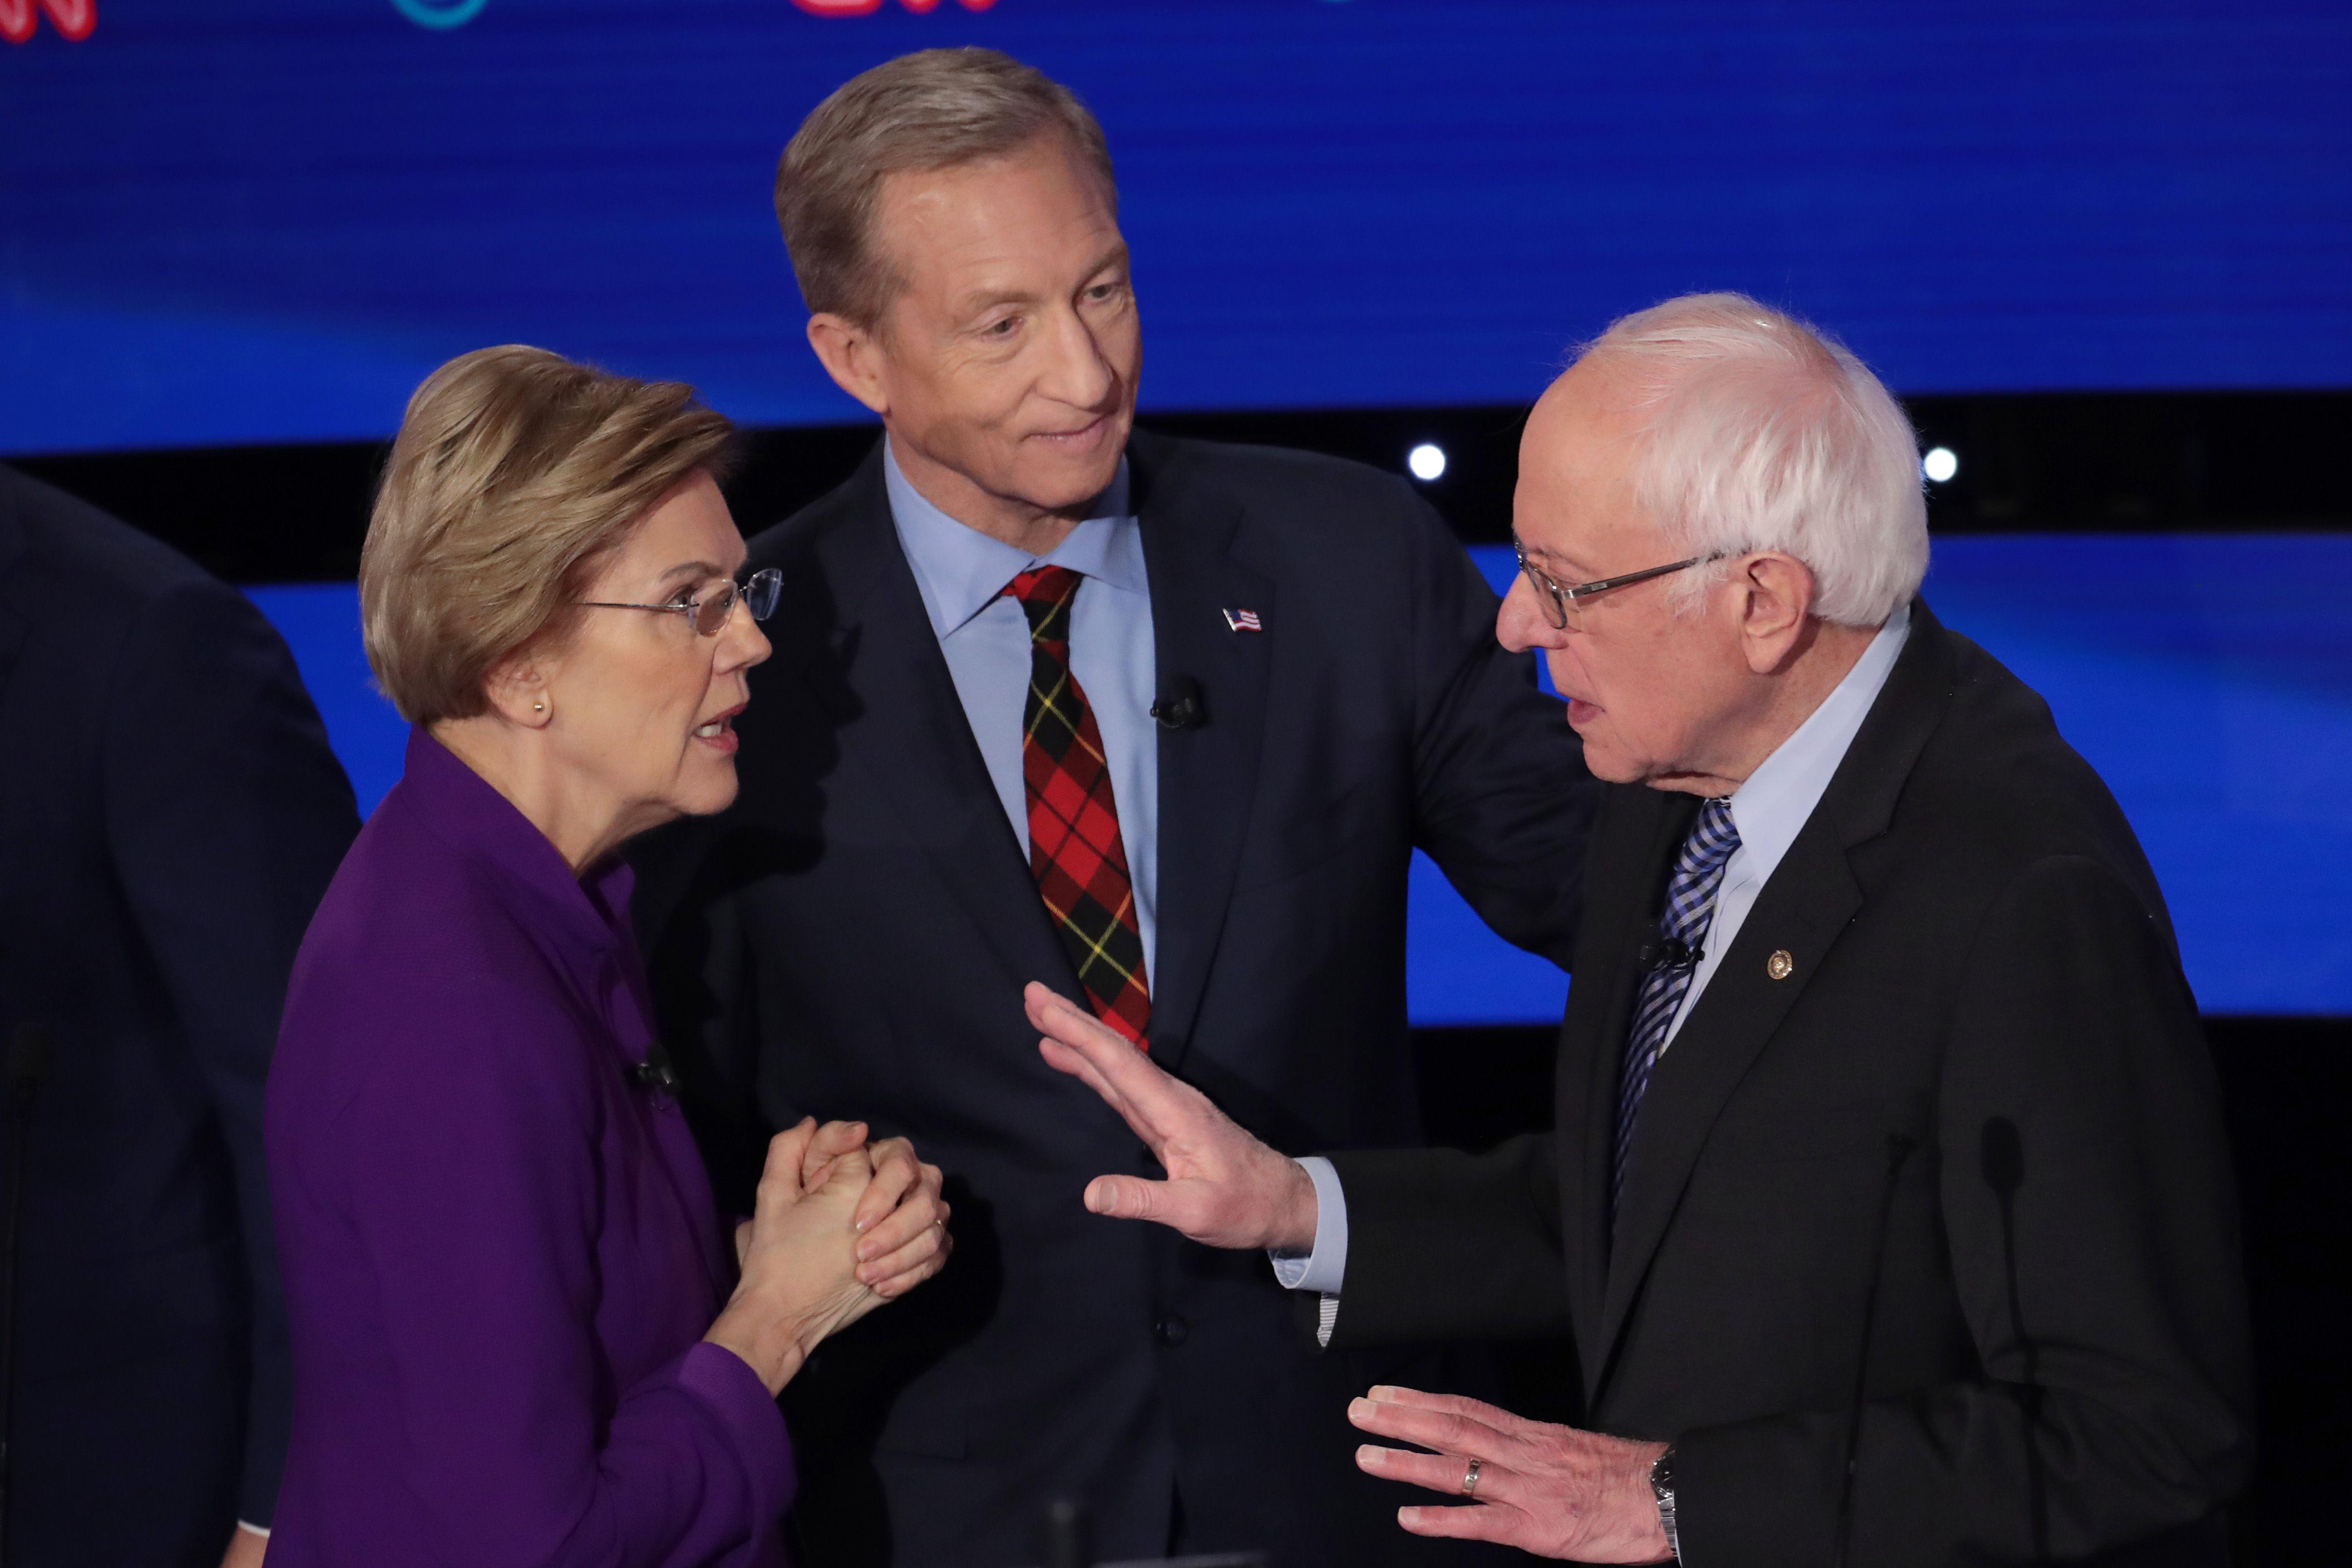 The Warren-Sanders Feud Is Not About #MeToo